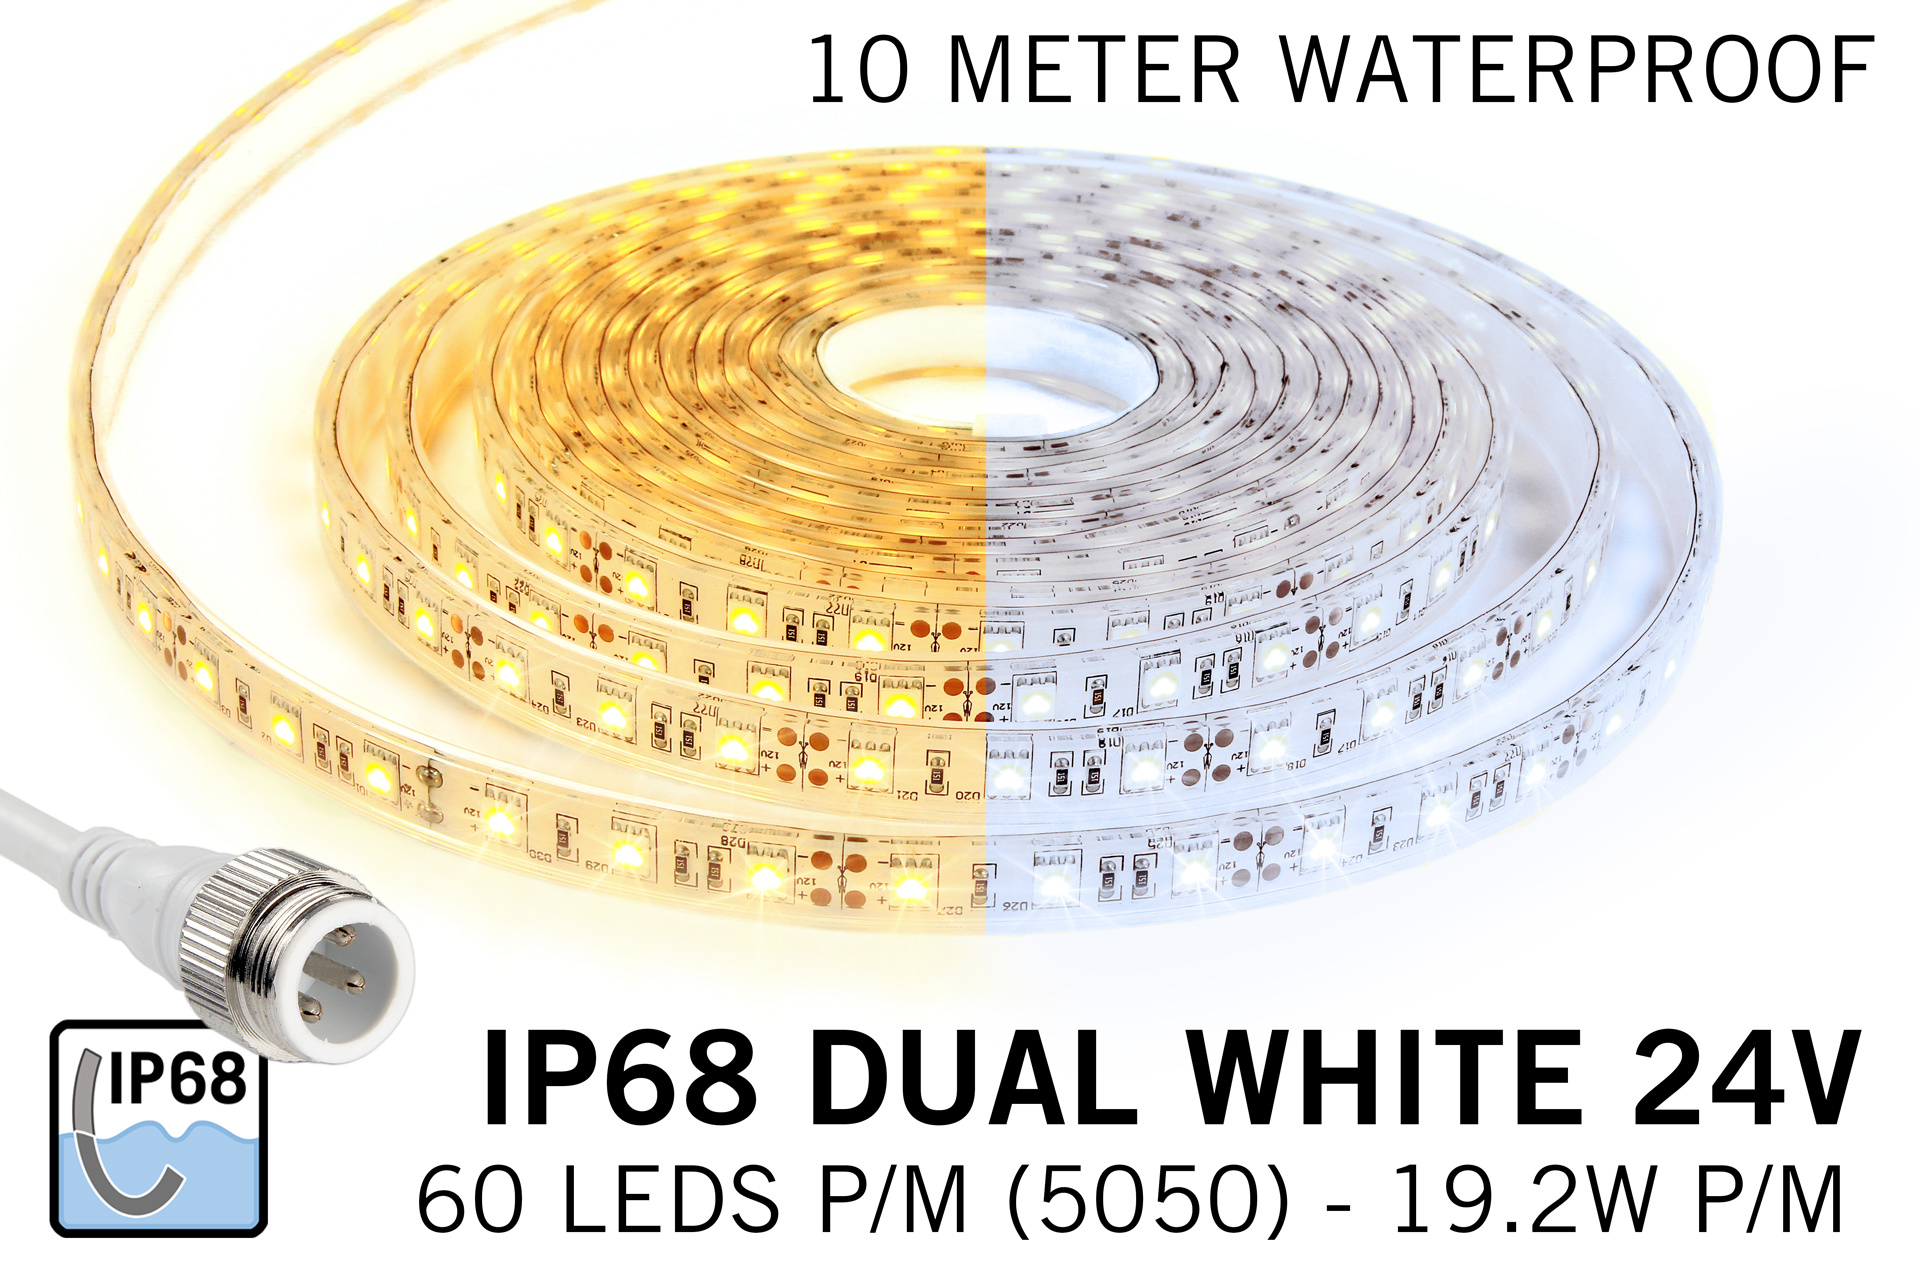 AppLamp Waterdichte Dual White CCT LED strip (IP68) met 60 LED's/pm 24V,  10 meter